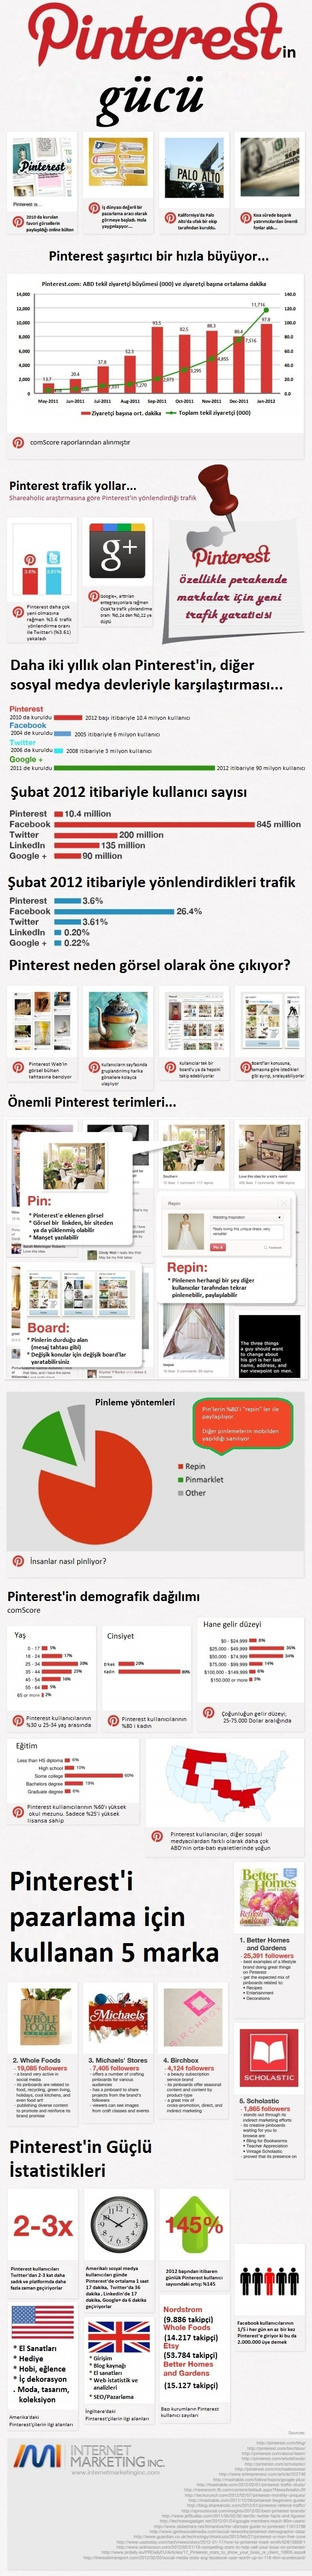 12 best İnfografik images on Pinterest | Info graphics, Infographic ...